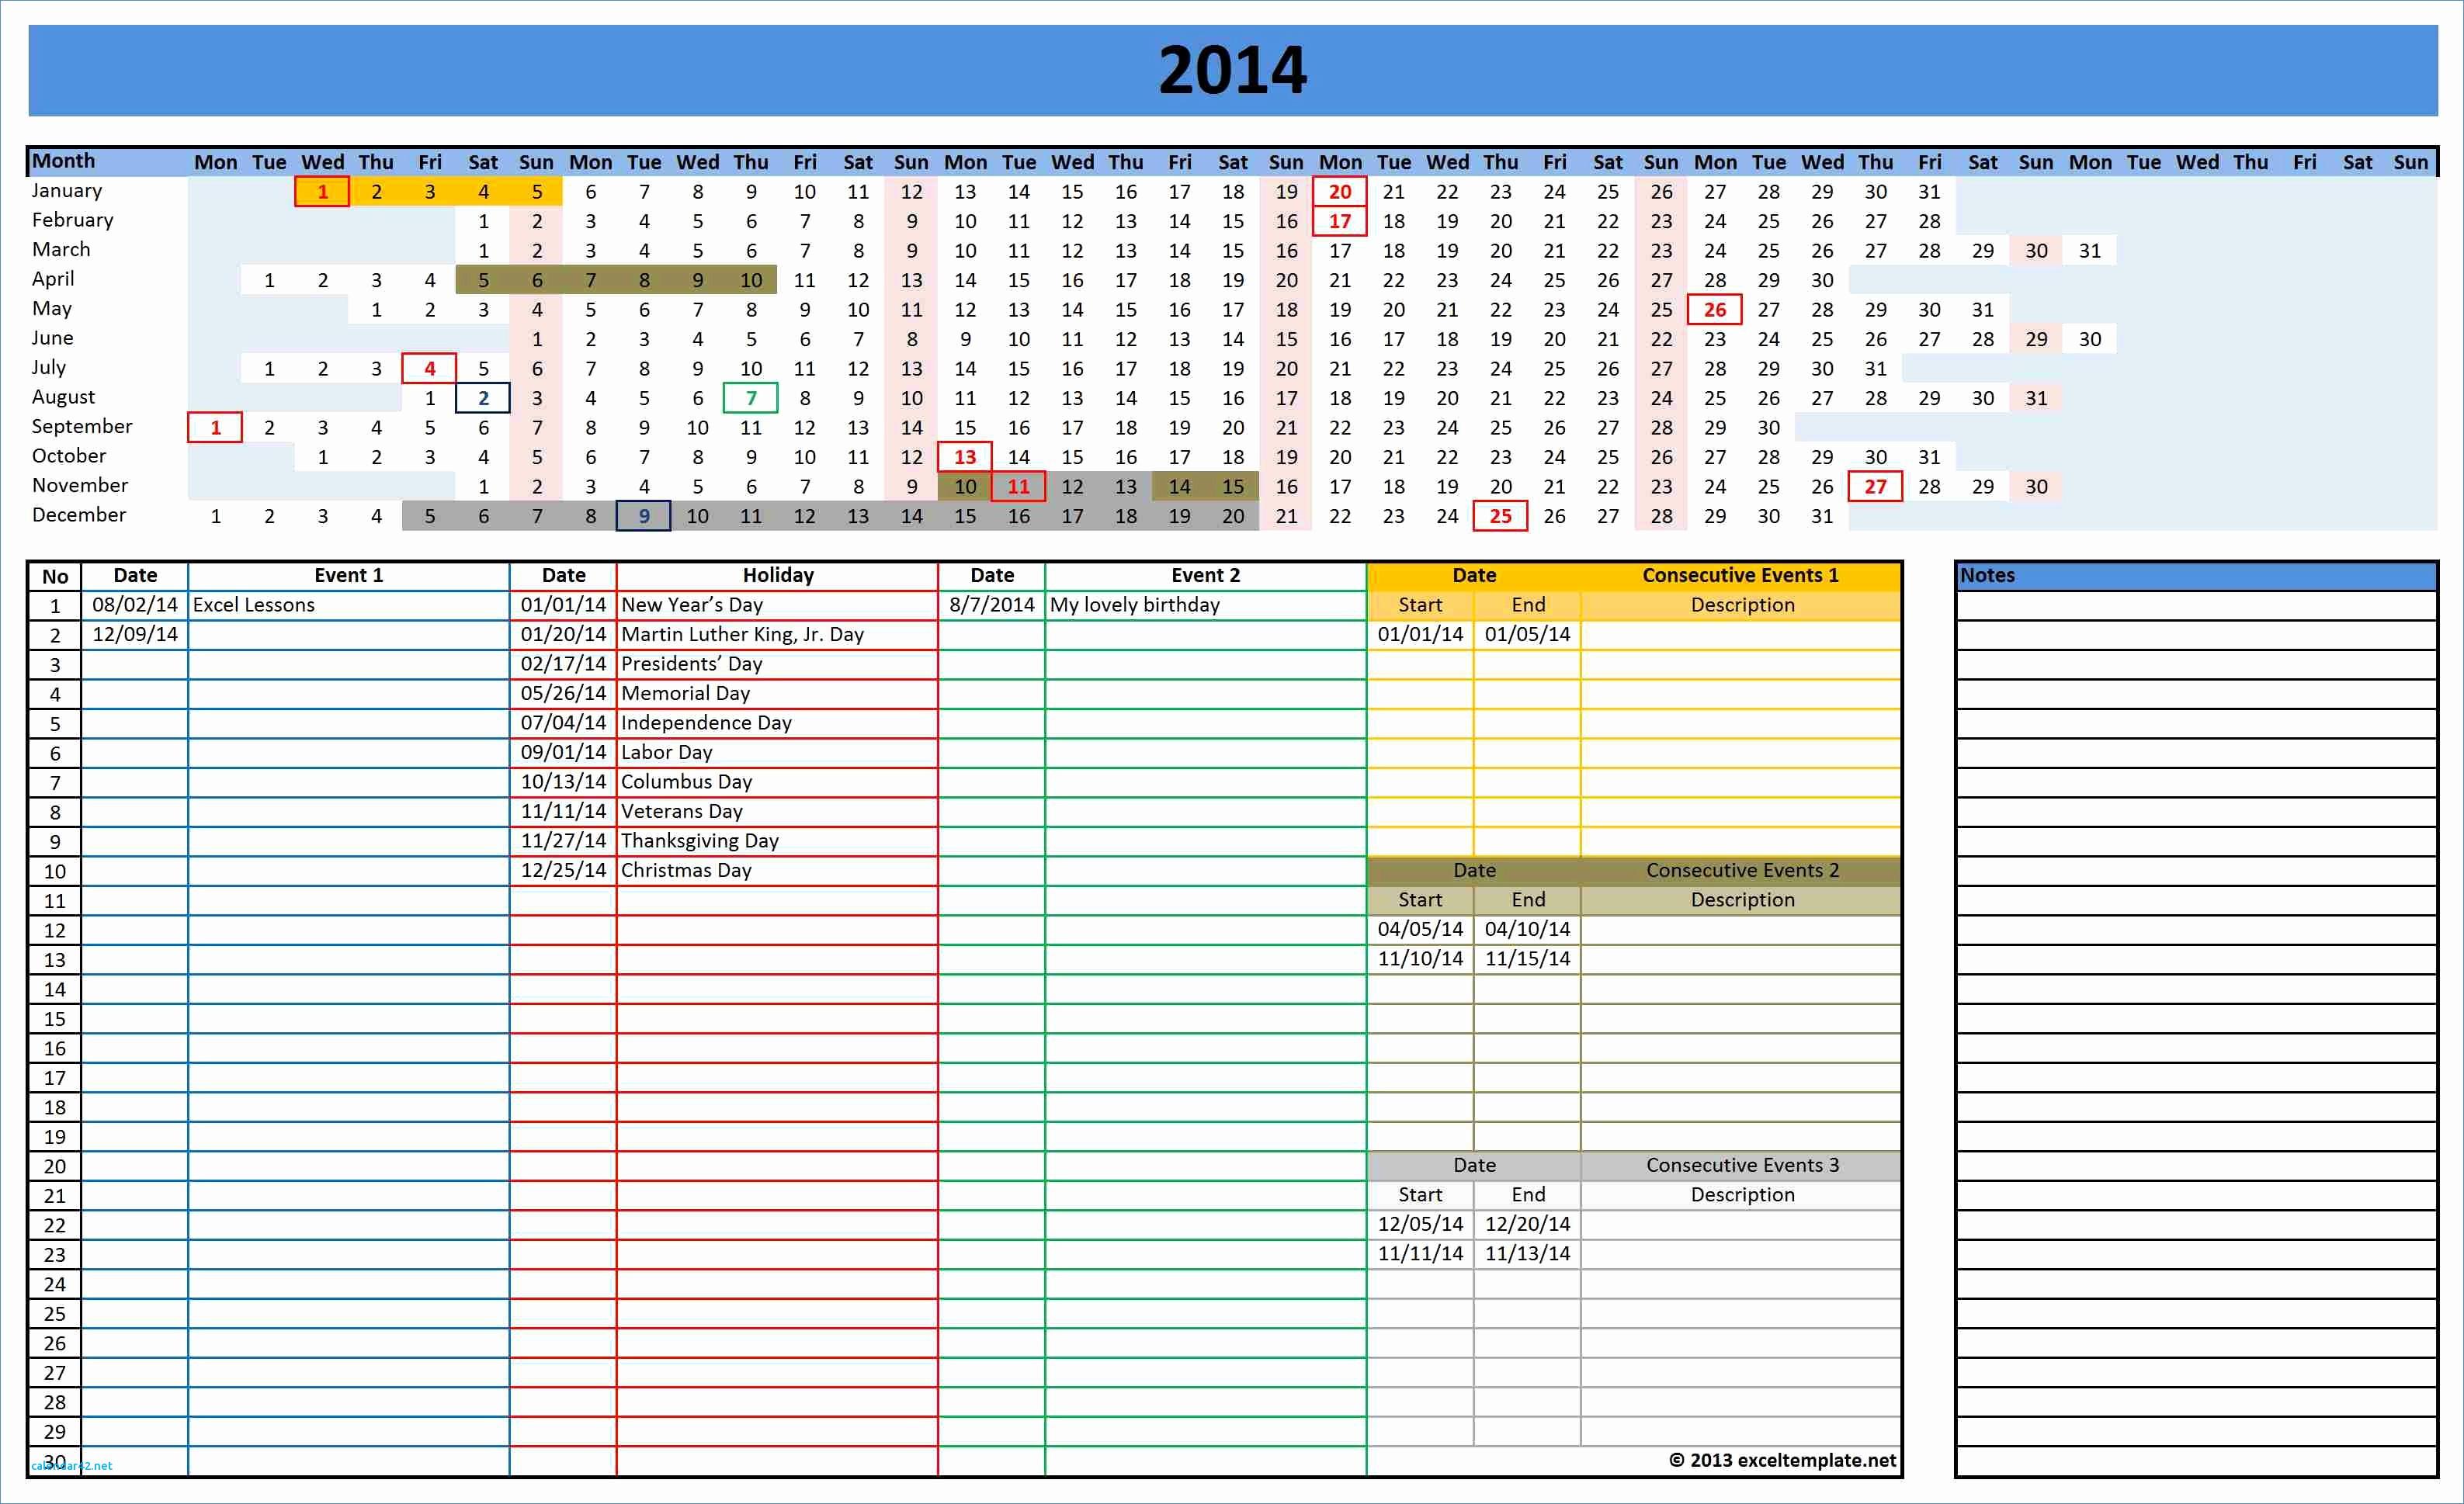 Uca Cash Flow Excel Template Awesome Uca Cash Flow Excel Template – thedl